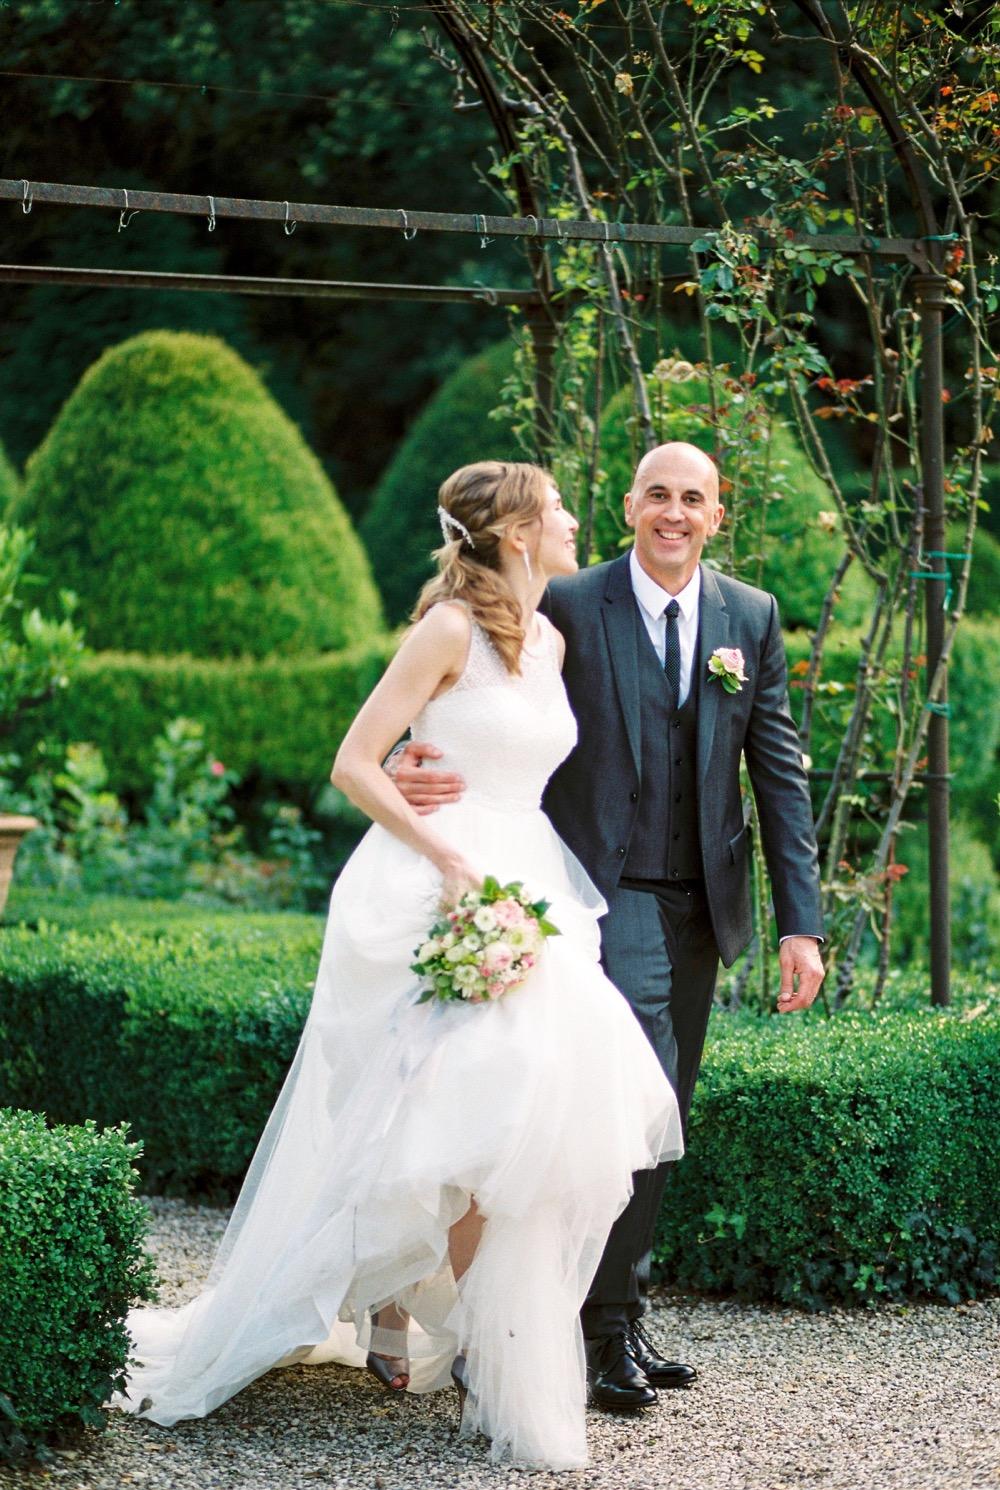 darya kamalova thecablookfotolab fine art film fhotographer in italy destination wedding como lake villa regina teodolinda villa pisani scalabrin-319